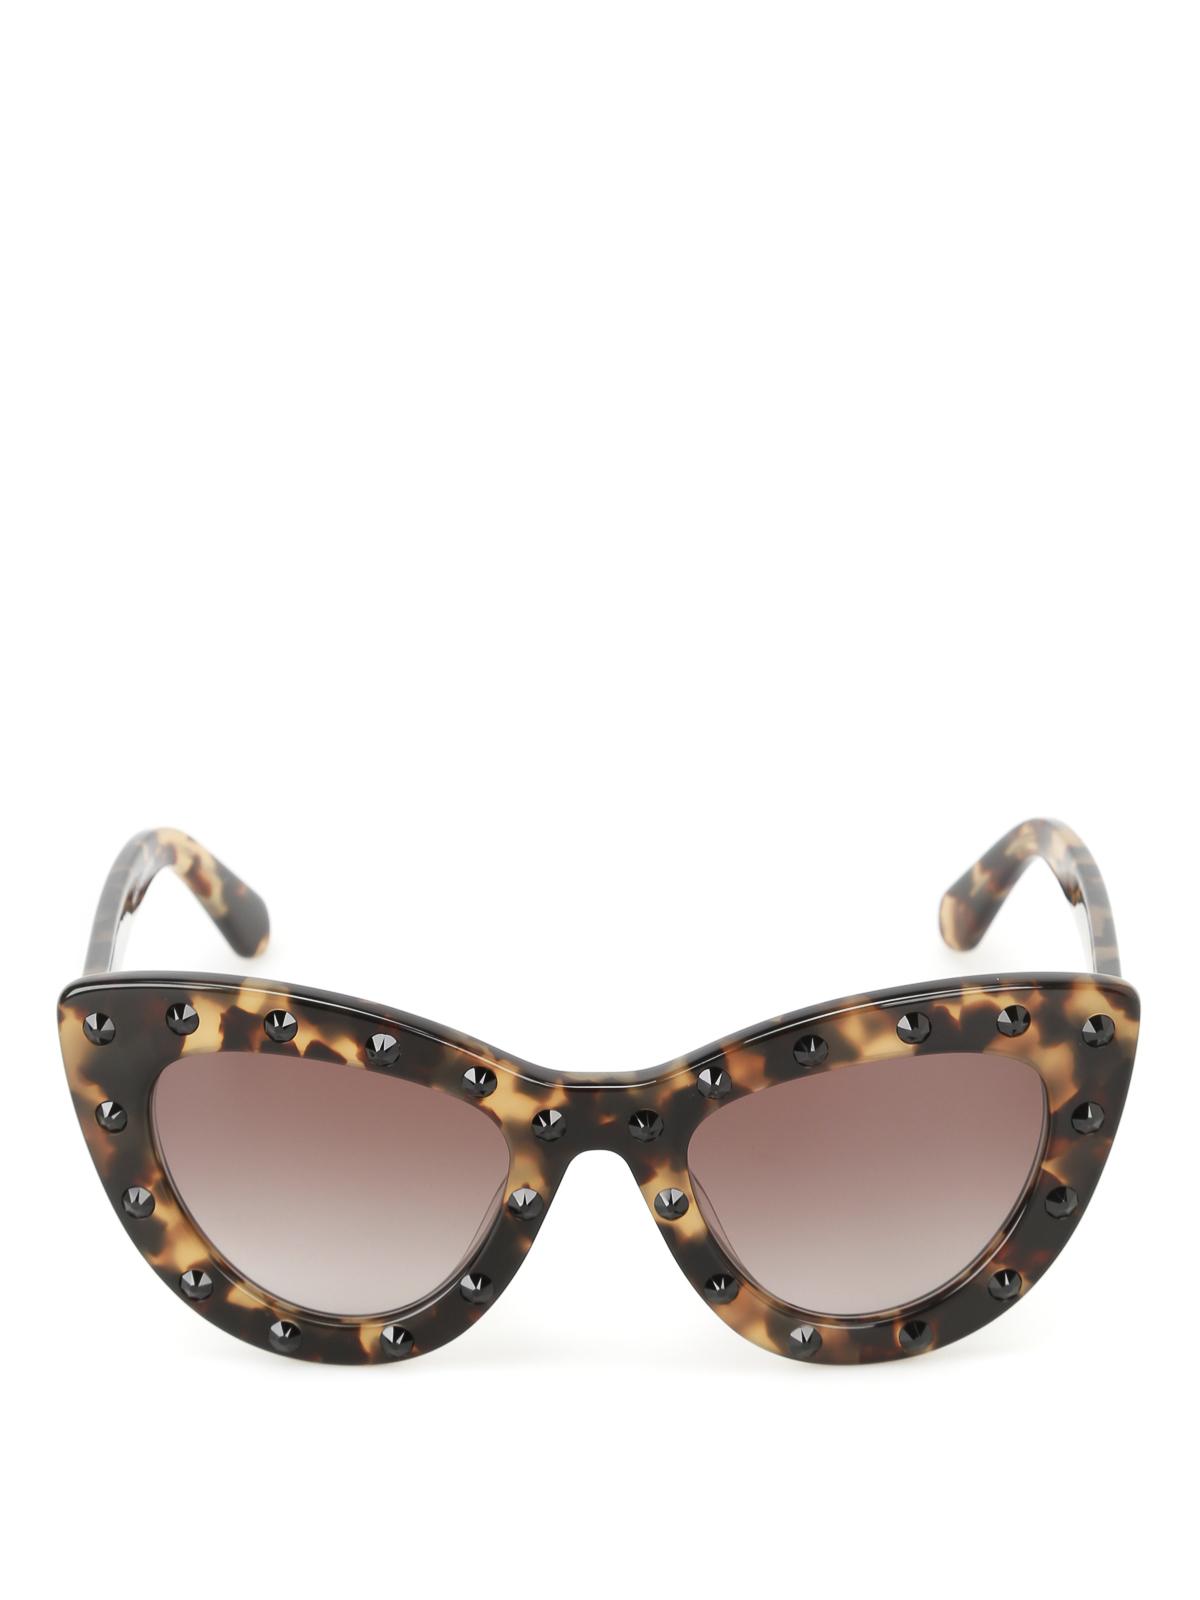 Kate Spade Damen Sonnenbrille lcvvG